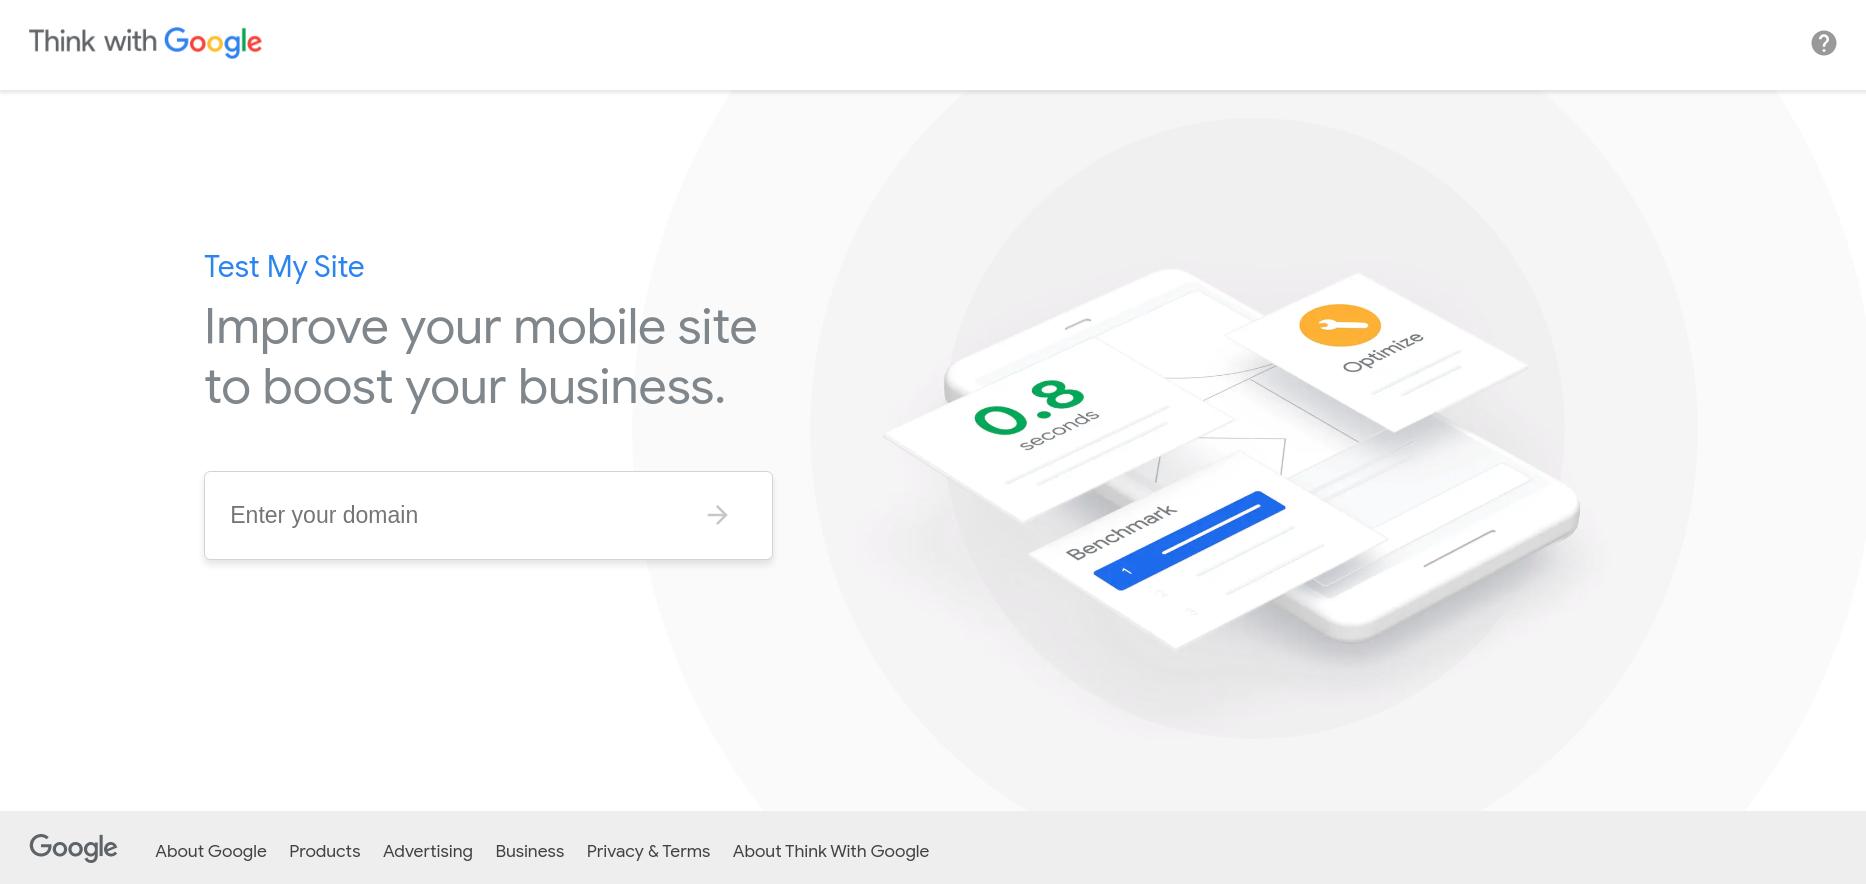 google-test-my-site